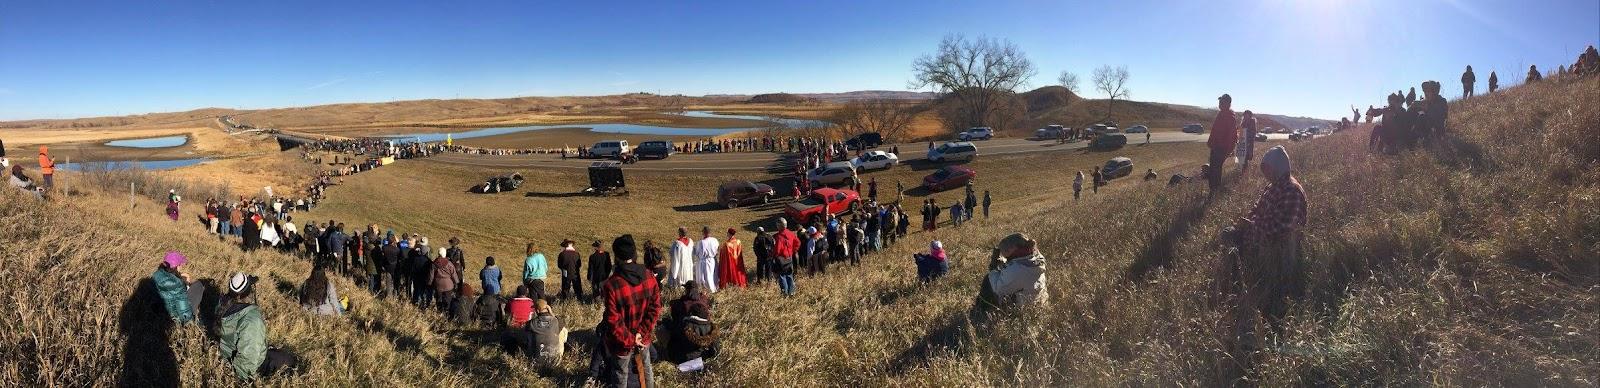 Standing Rock Panorama.jpg